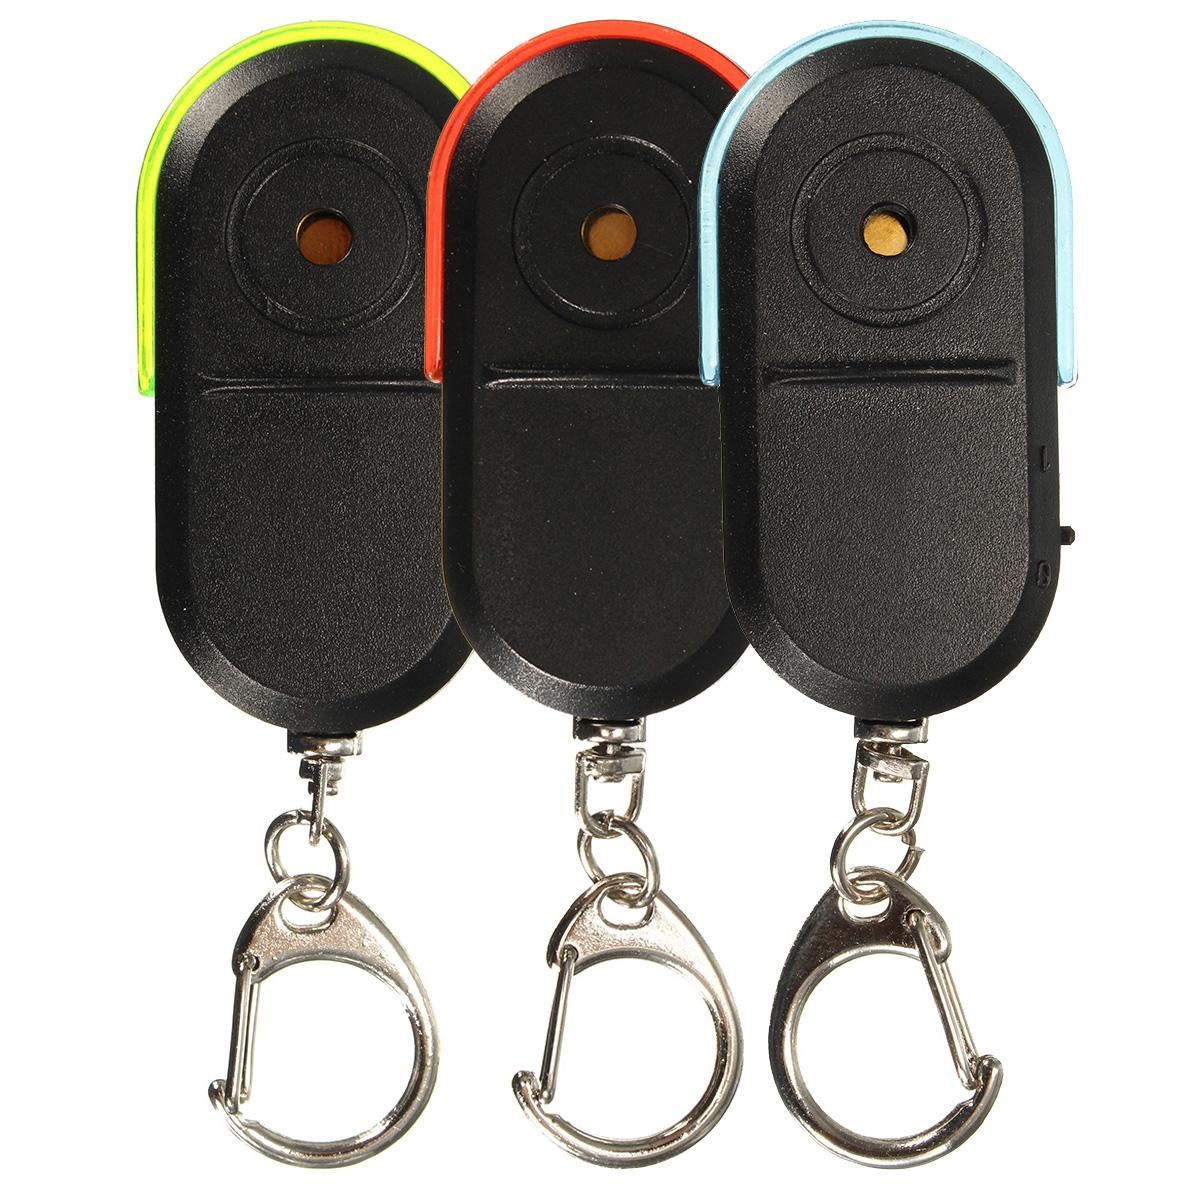 High Quality Portable Size Wireless Anti-Lost Alarm Key Finder Locator Keychain Whistle Sound LED Light Sound LED Light Locator